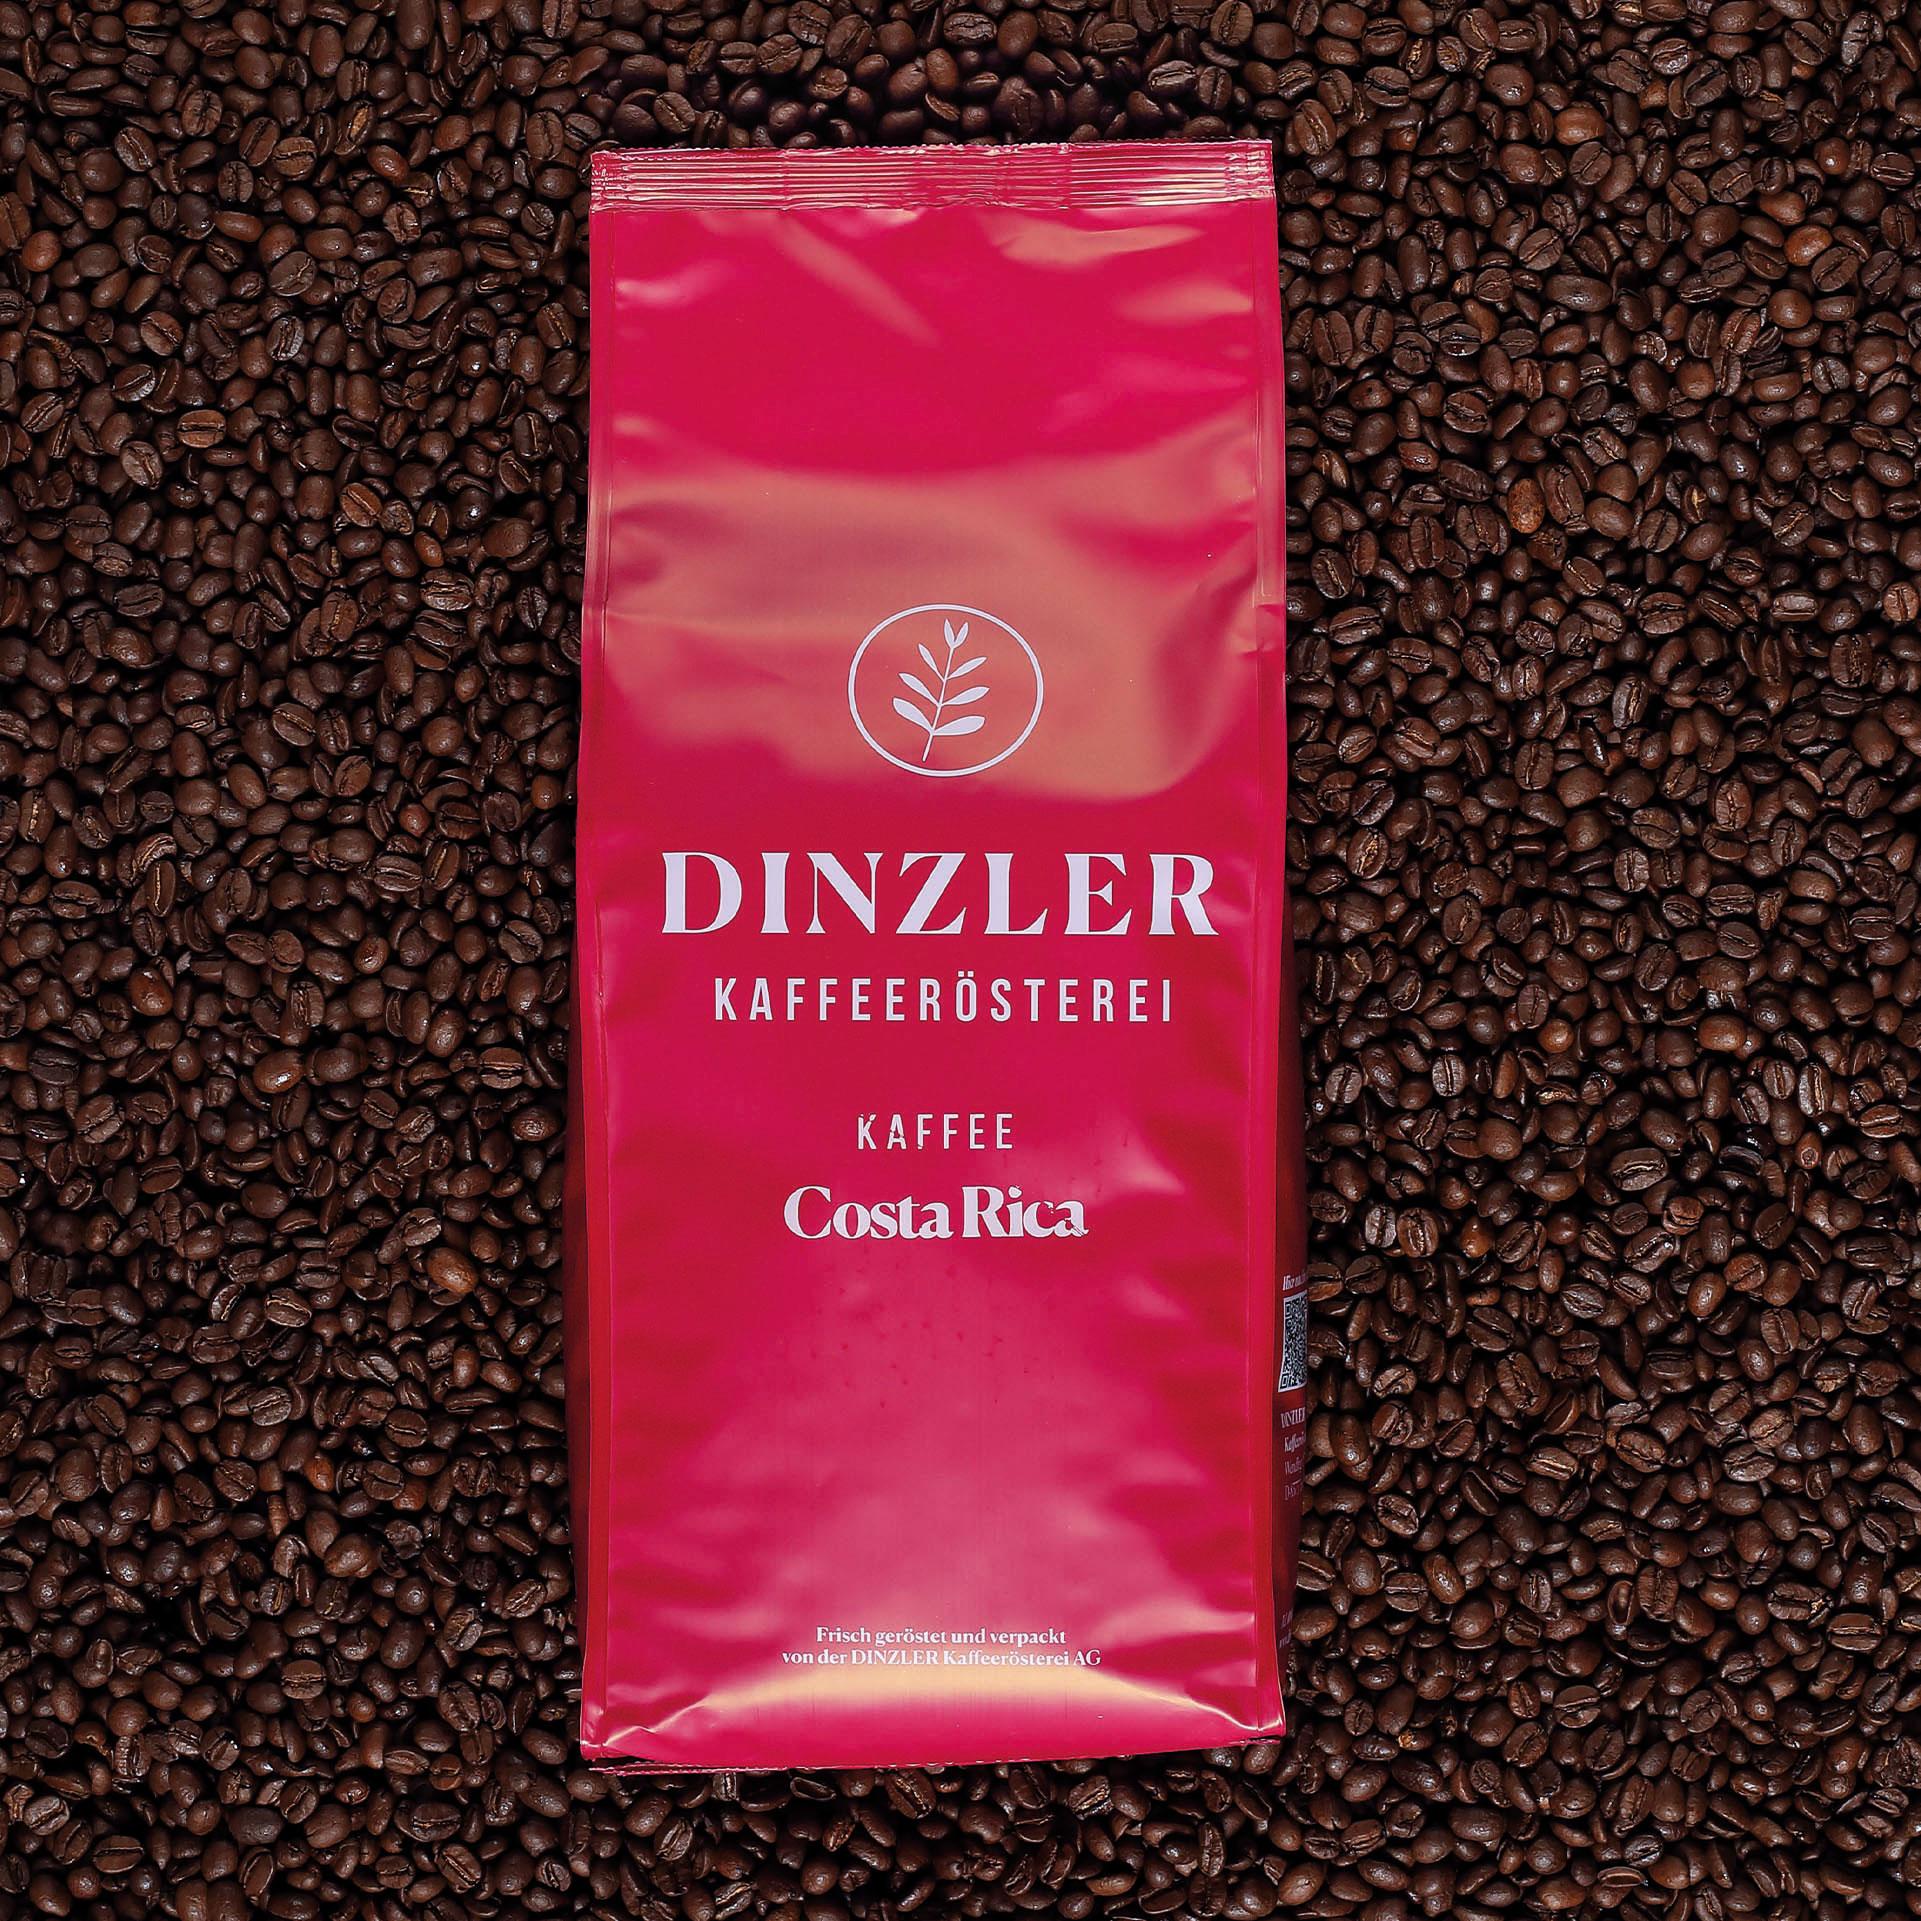 Kaffee Costa Rica | DINZLER Shop